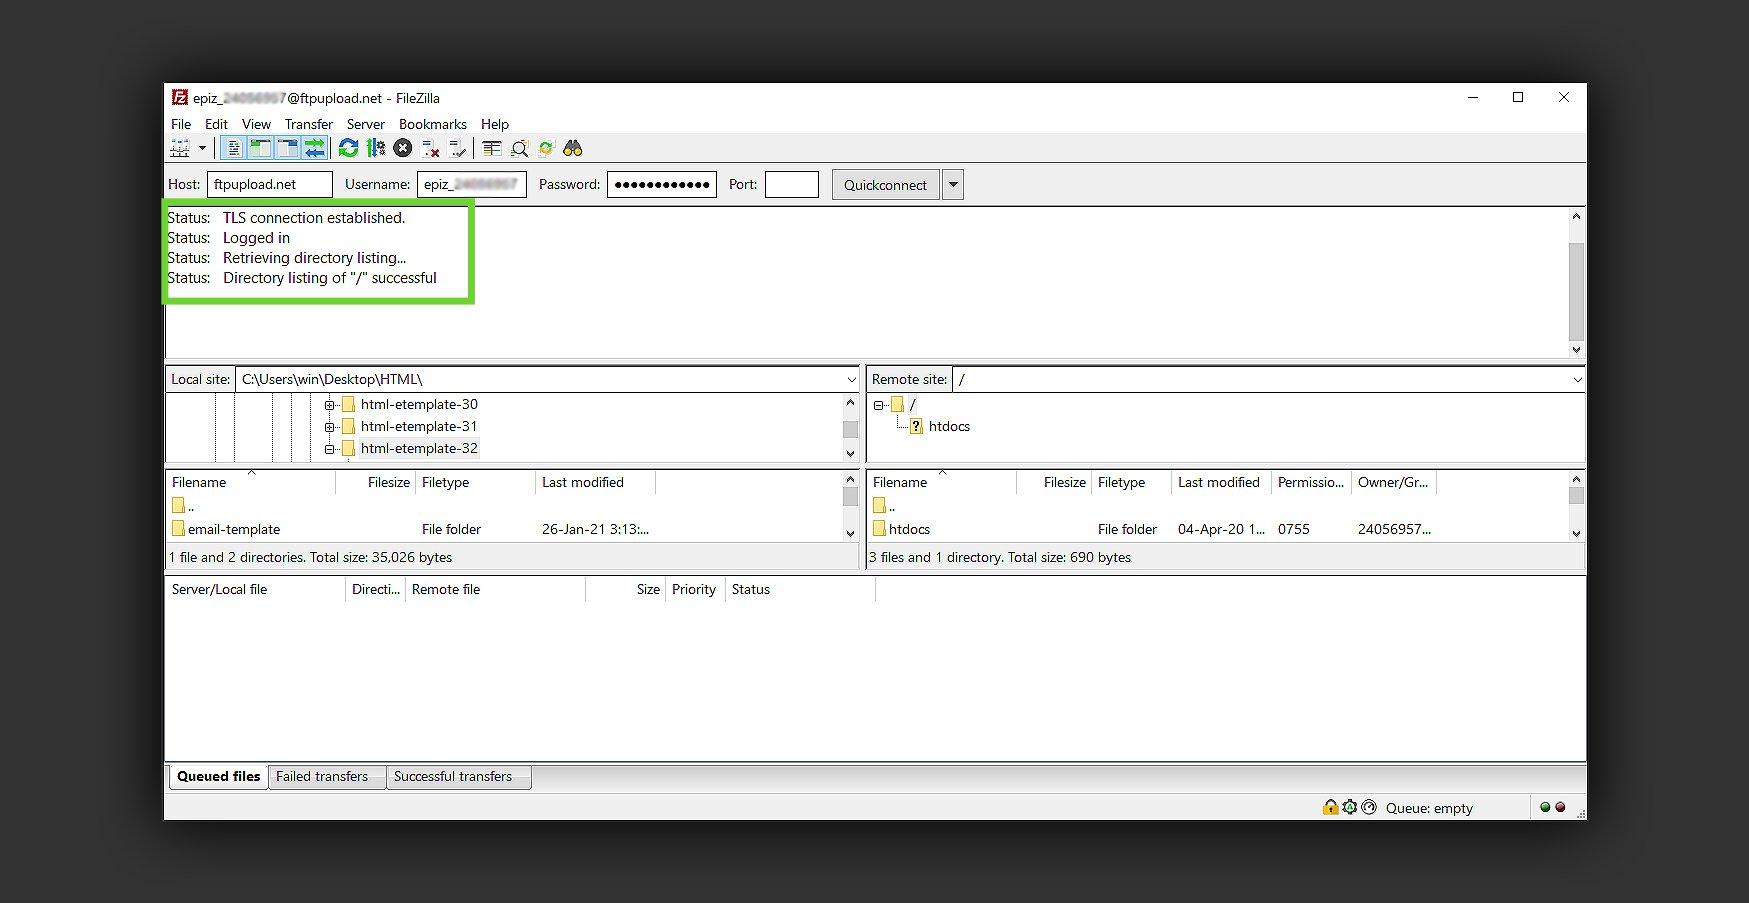 FileZilla host access